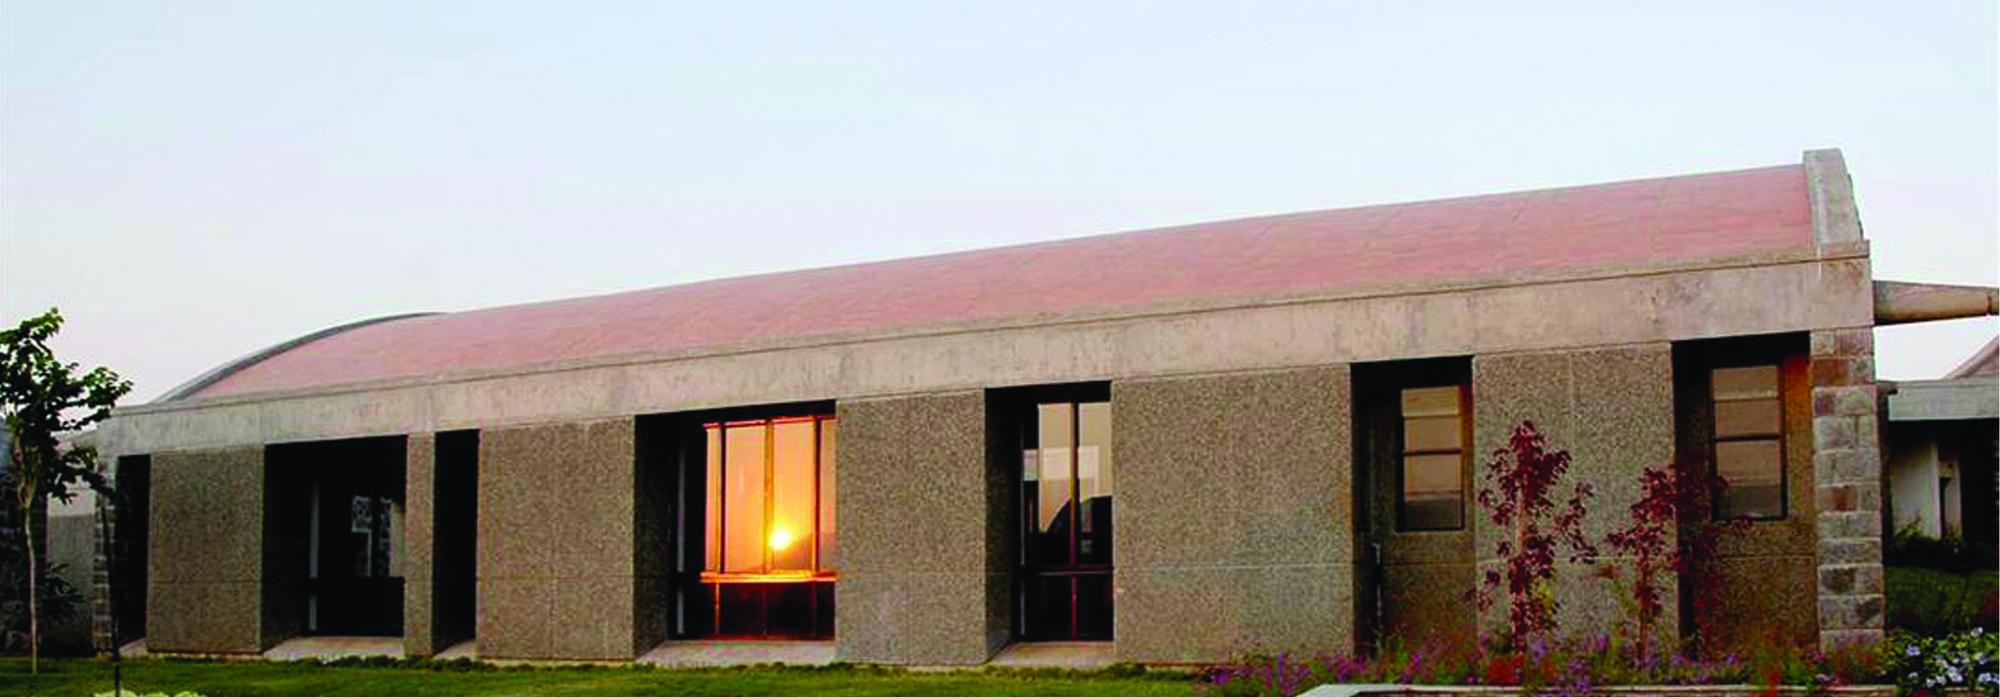 The Heritage School  / Madhav Joshi and Associates